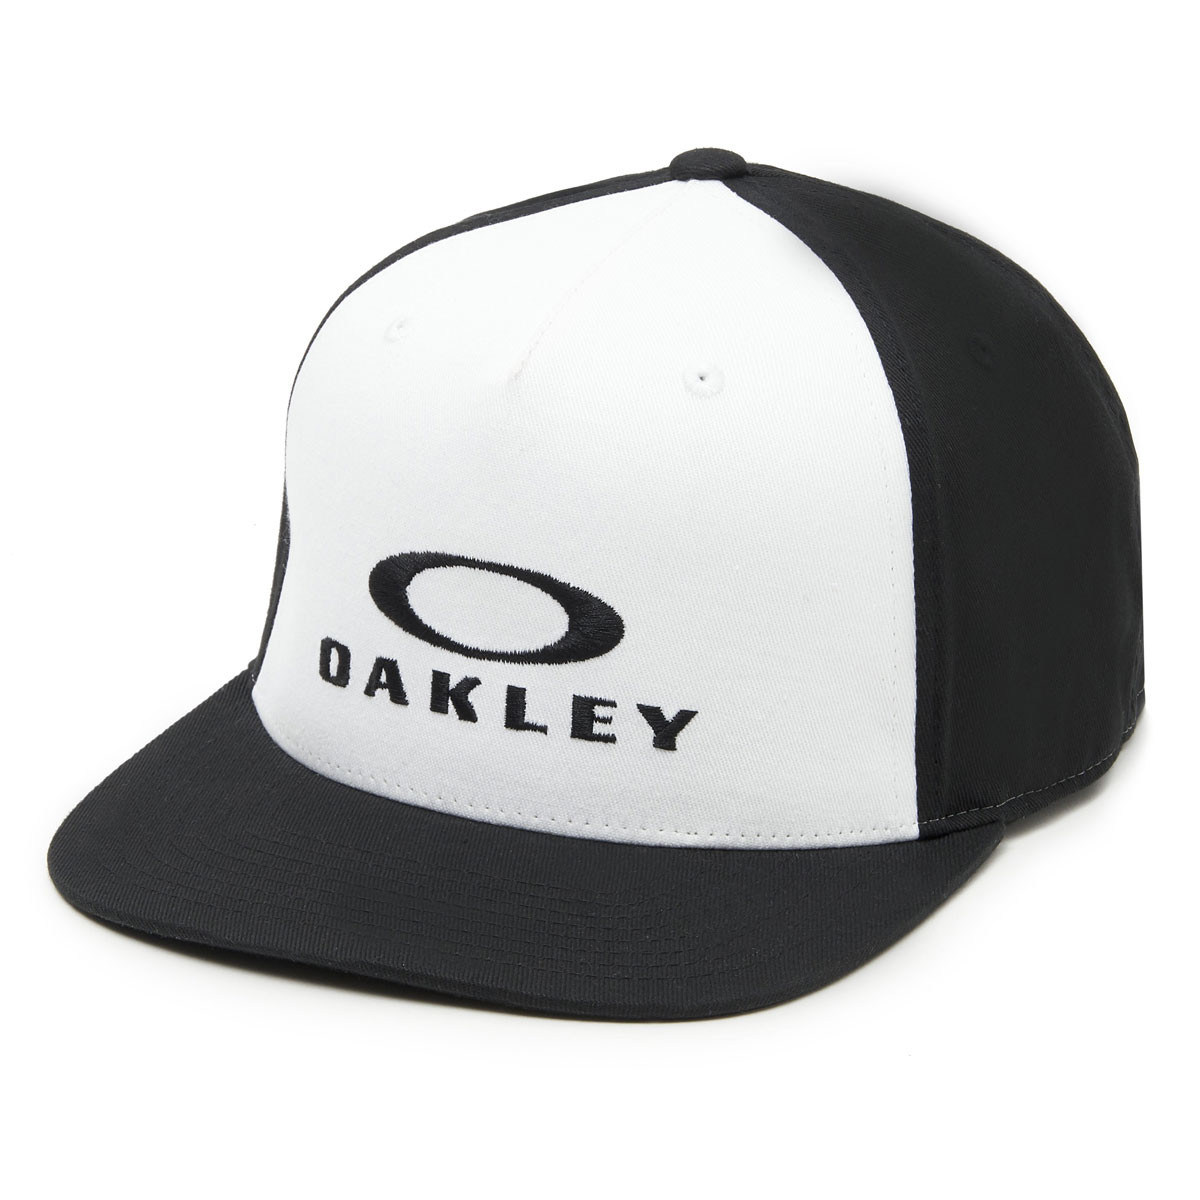 popular stores amazing price los angeles Oakley Mens Silver 110 Flexfit Hat